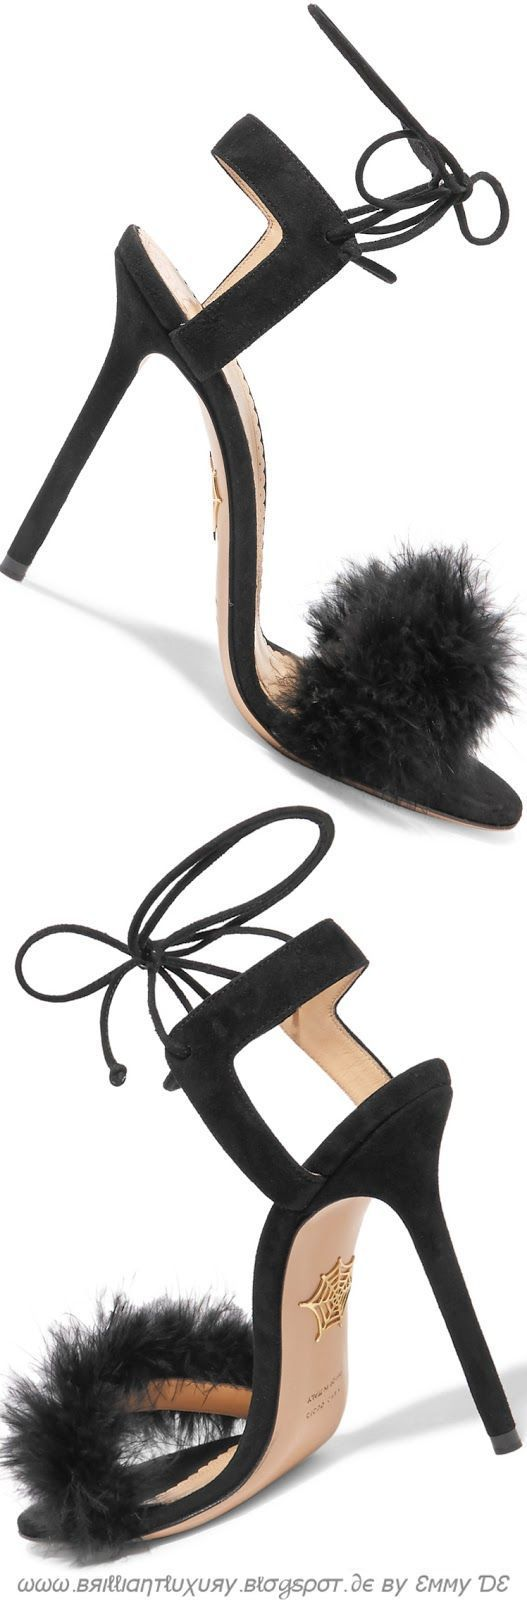 Brilliant Luxury by Emmy DE ♦Charlotte Olympia 'Salsa' #charlotteolympiaheelsfashion #charlotteolympiaheelszapatos